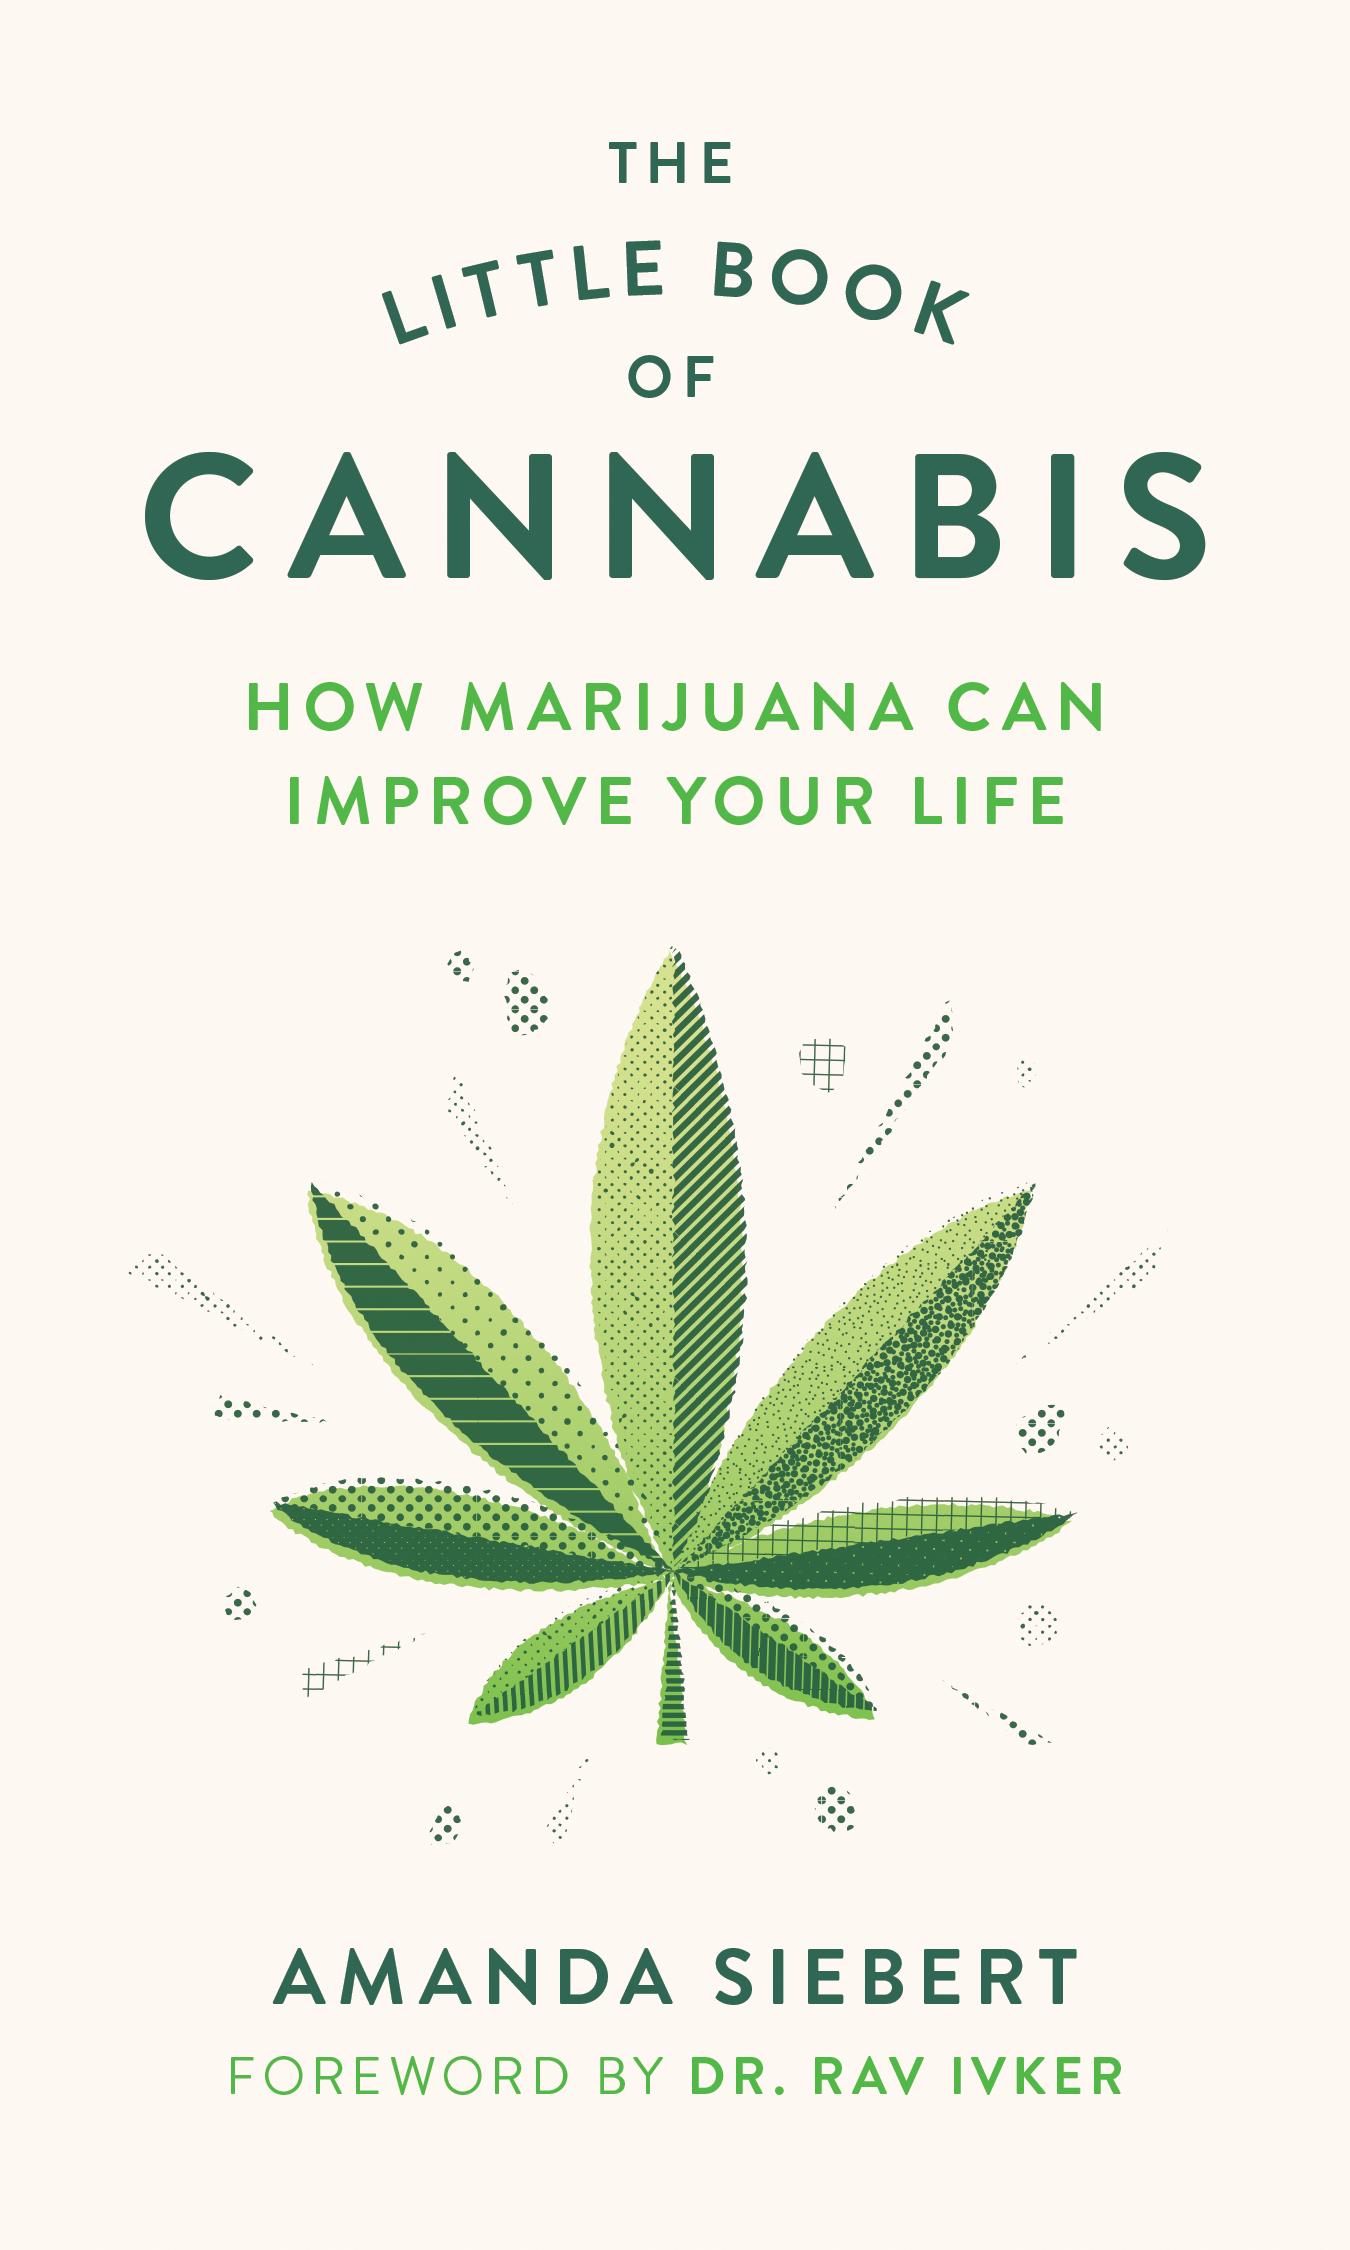 thelittlebookofcannabis